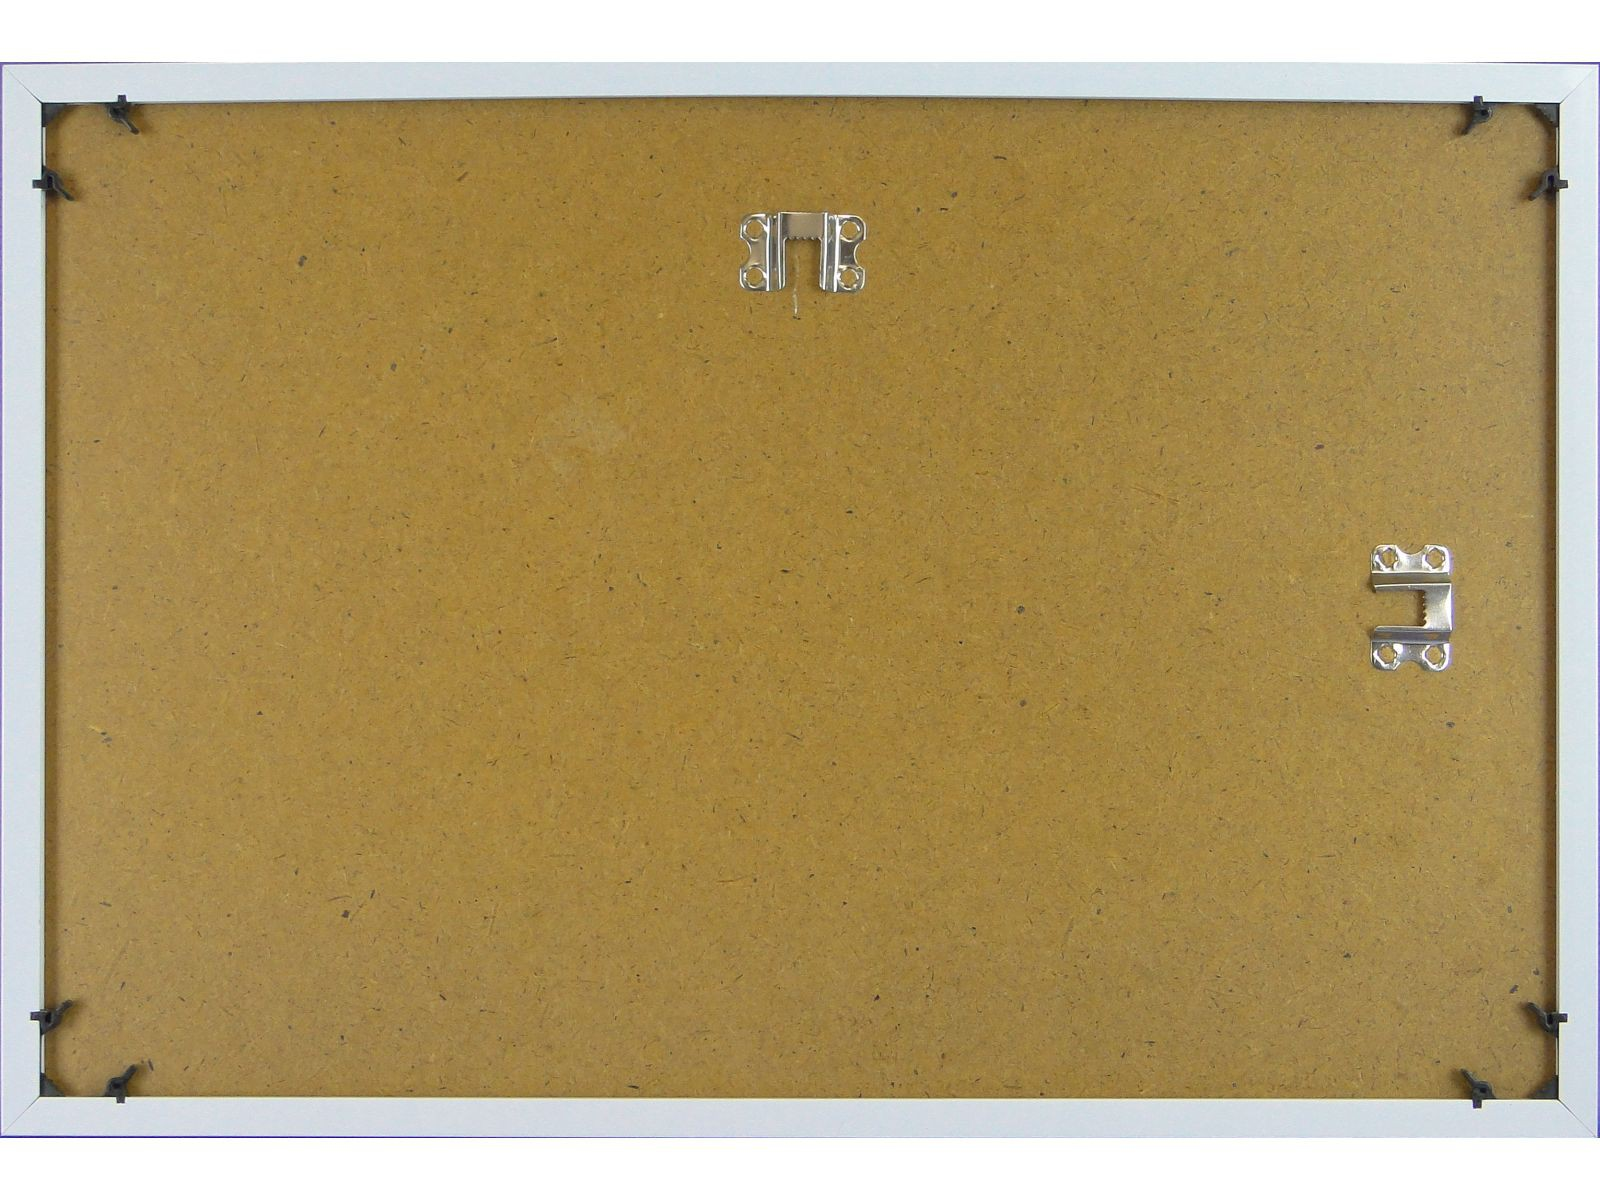 DSC05853.JPG (1600�1200)